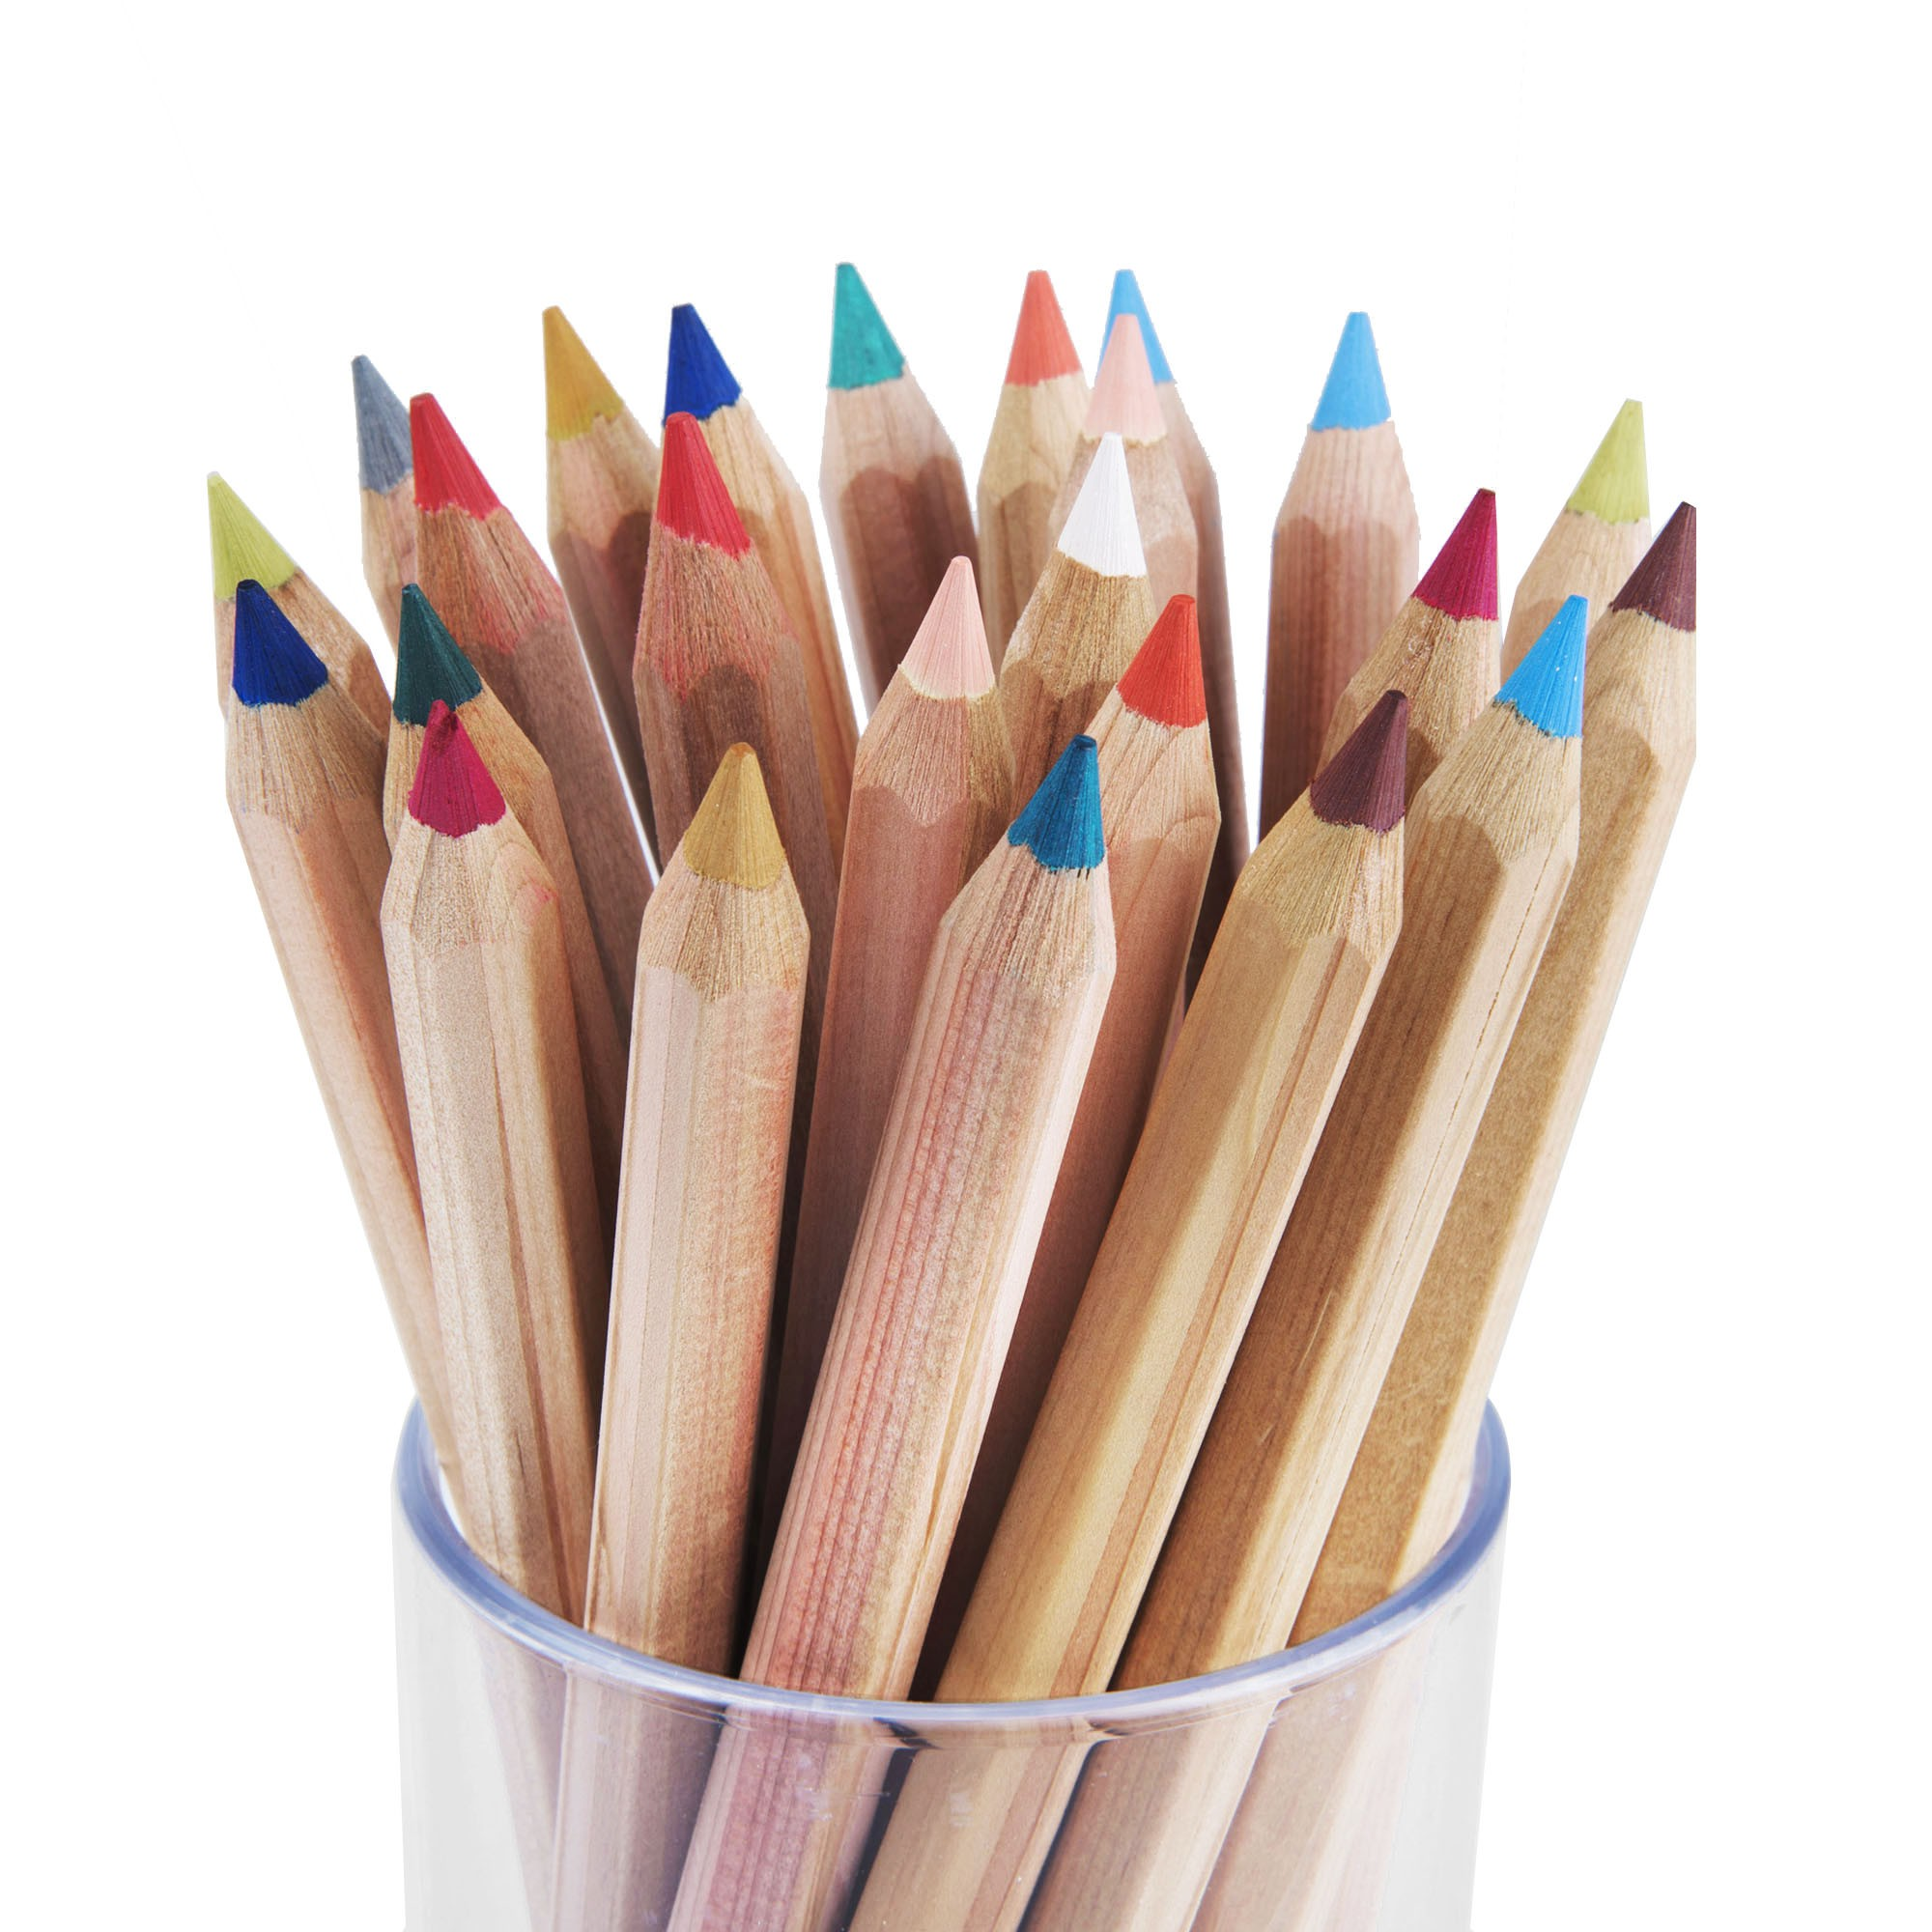 Gros crayons de couleur x 24 made in germany - Tuto trousse crayons de couleur ...